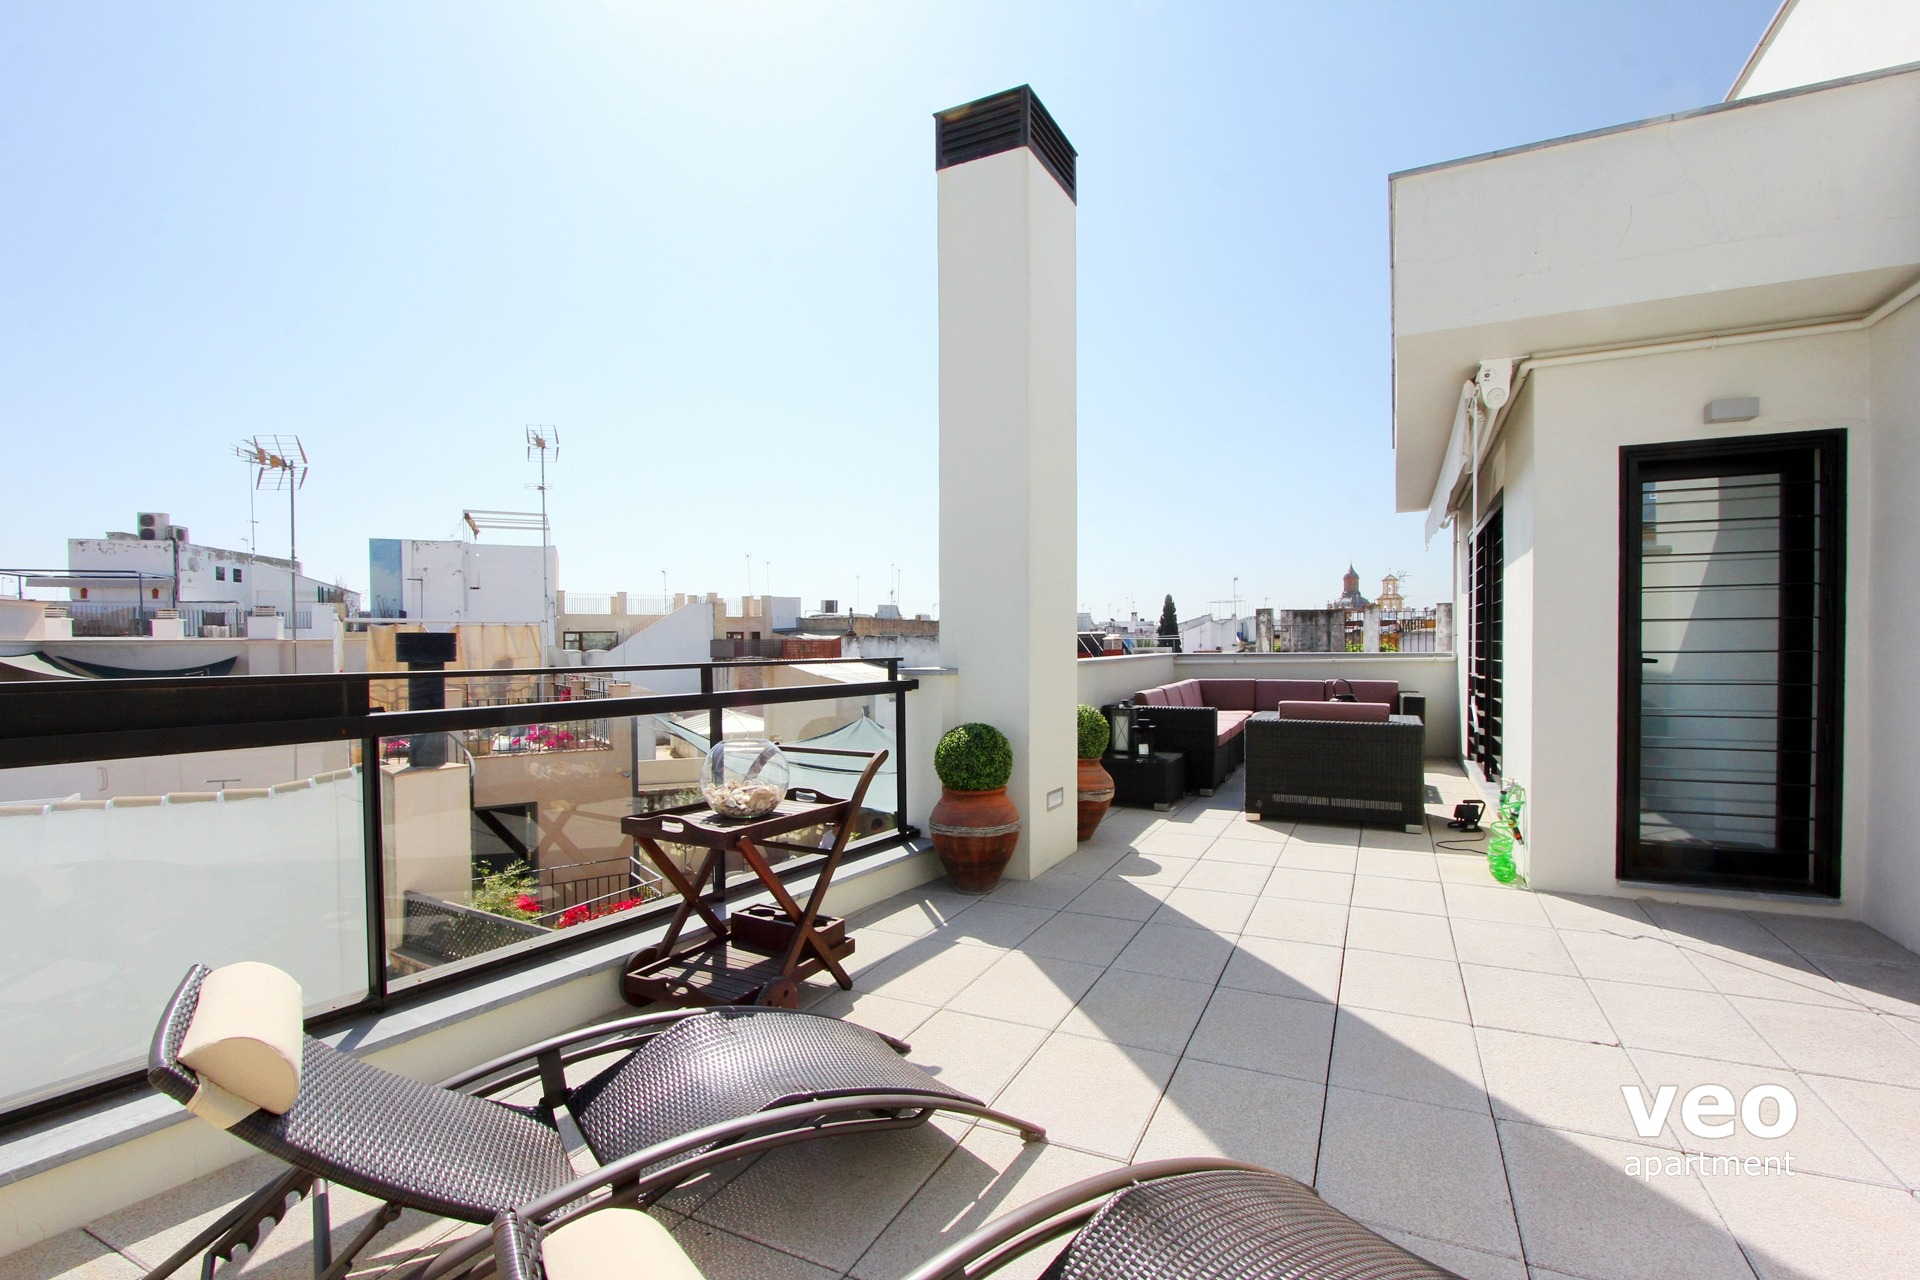 Seville Apartment Corral Del Rey Street Seville Spain